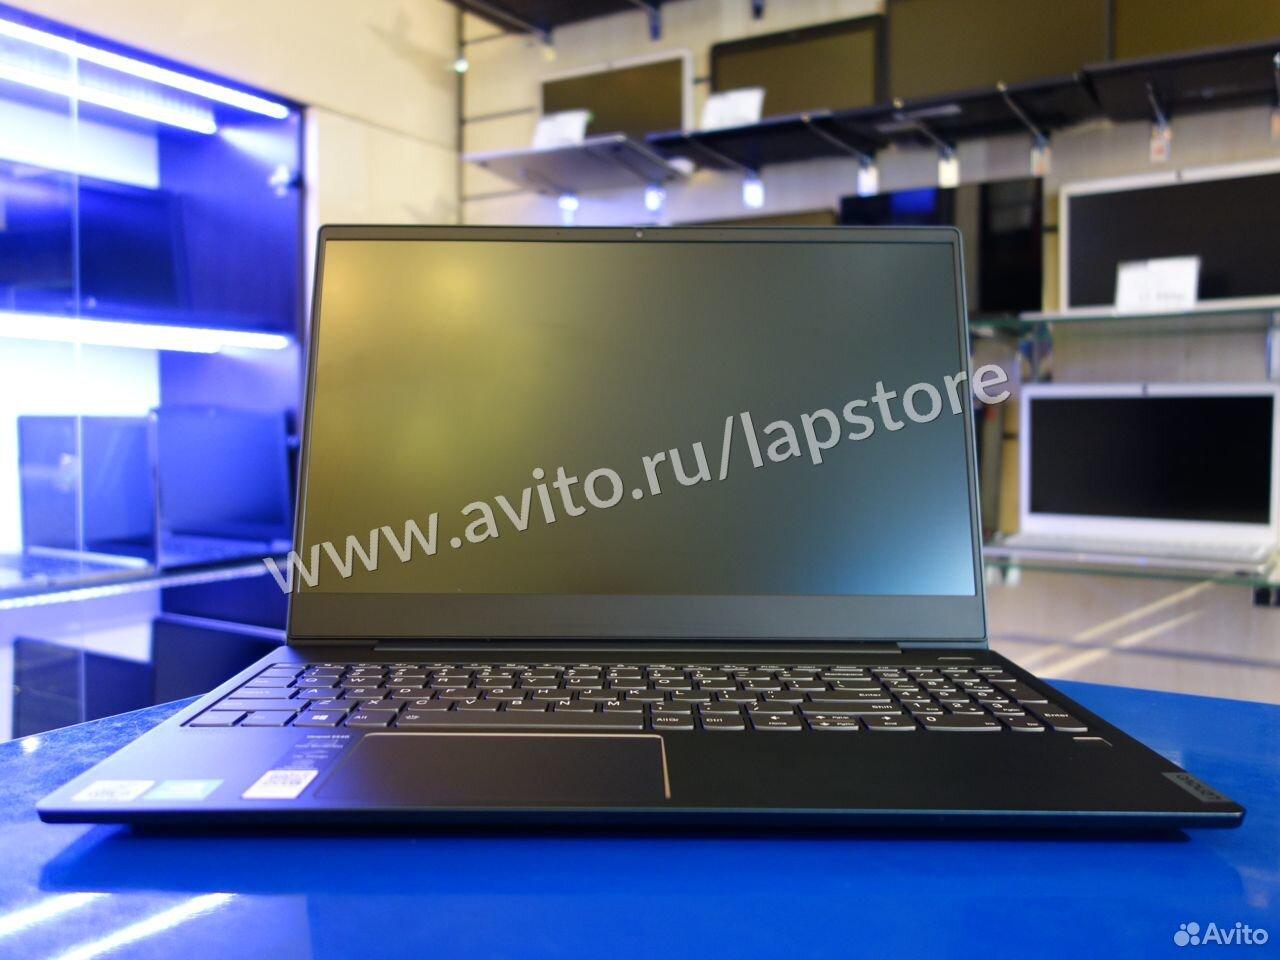 Ноутбук Lenovo S540 i5-10210/8G/512G SSD/MX250 2GB  84012422018 купить 3